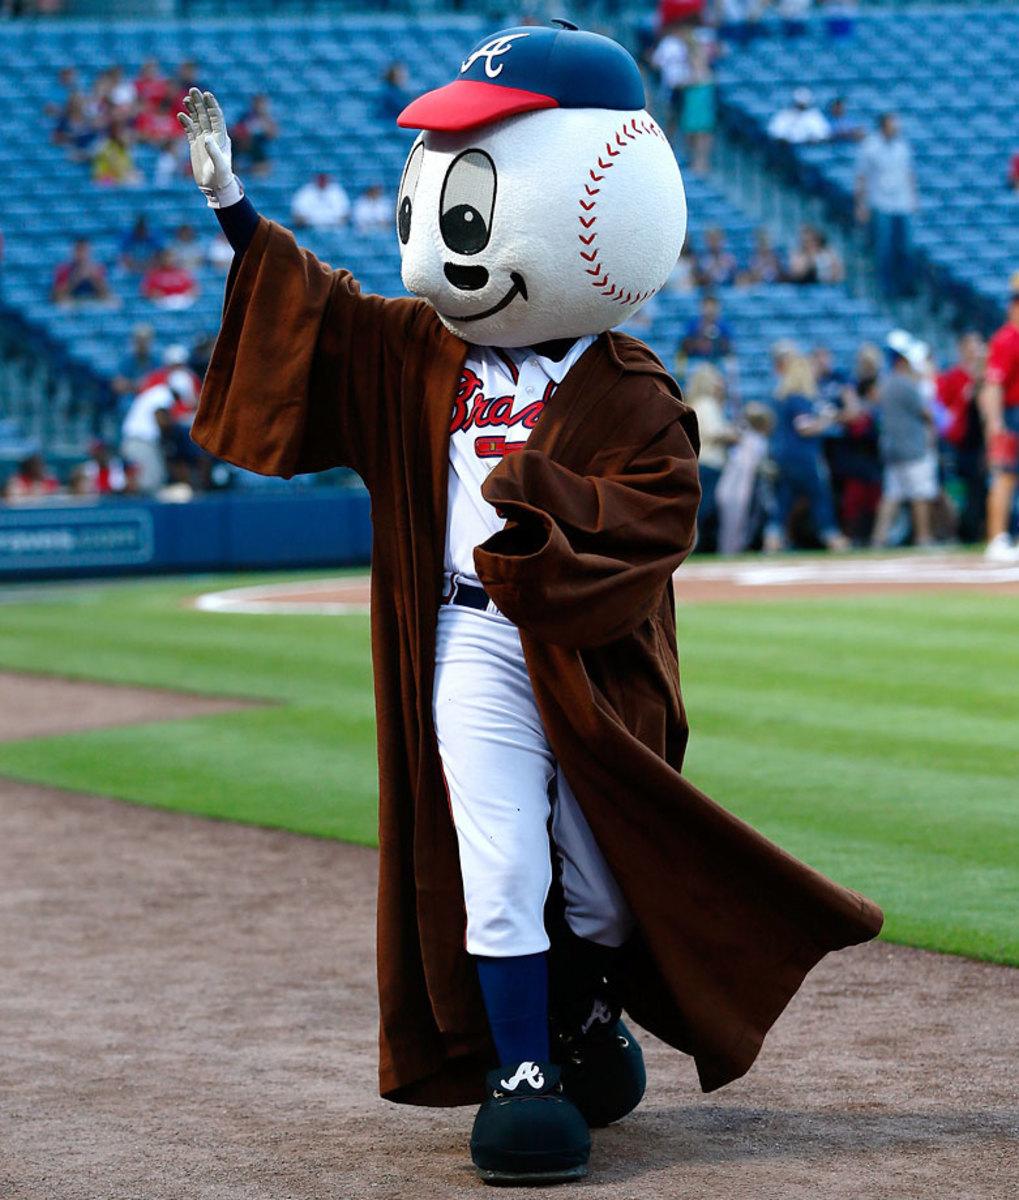 2014-0919-Atlanta-Braves-mascot-homer-Star-Wars.jpg